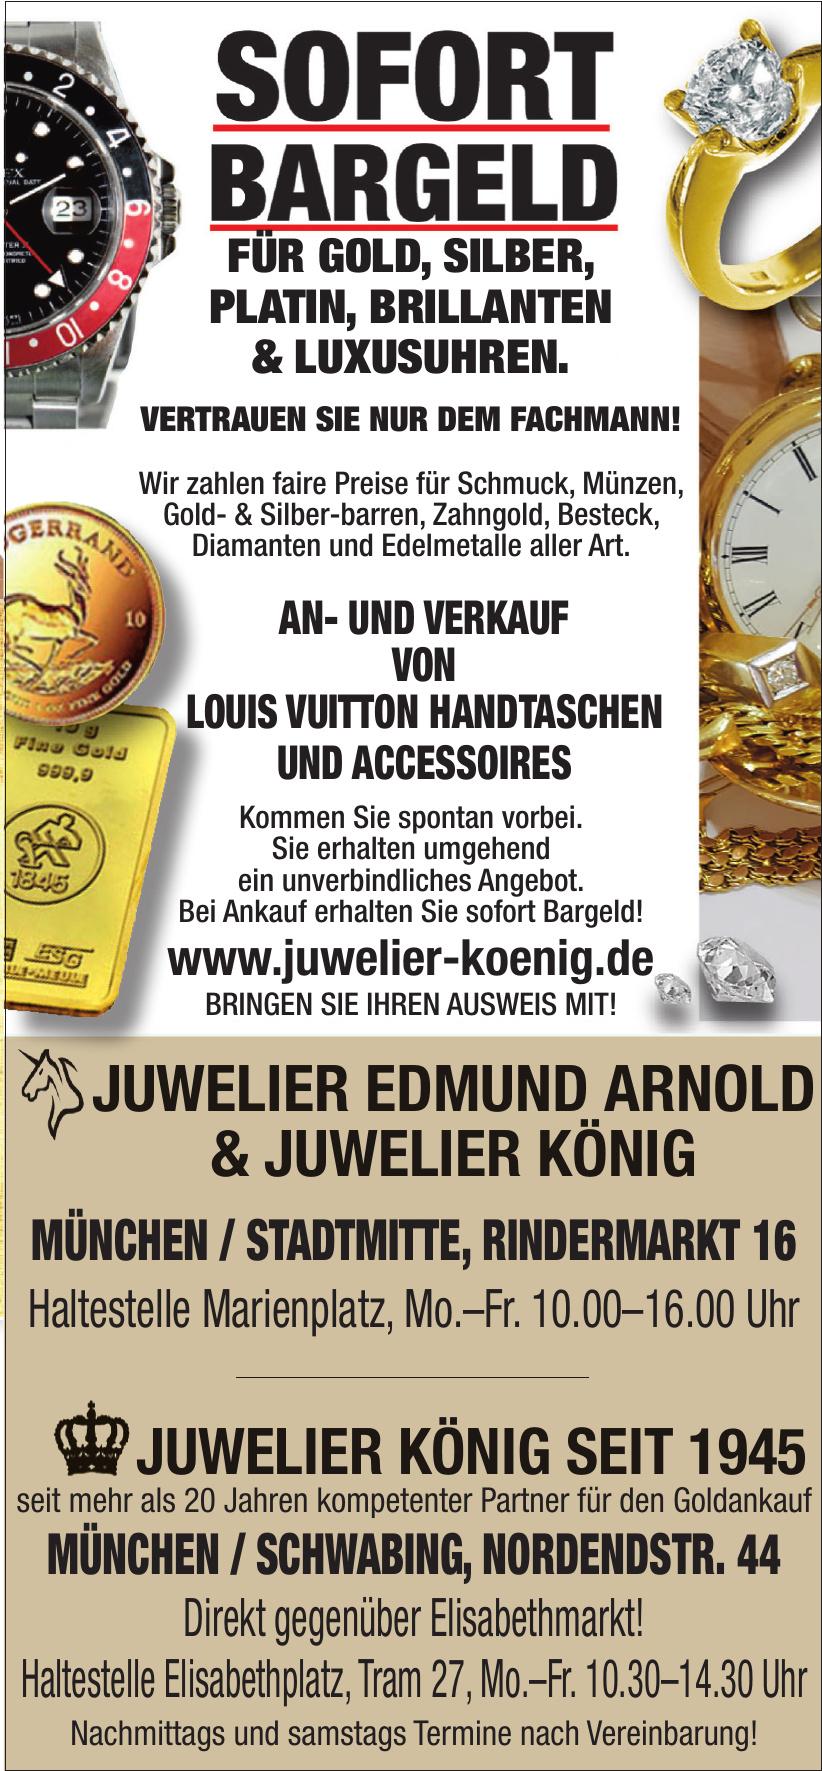 Juwelier Edmund Arnold & Juwelier König